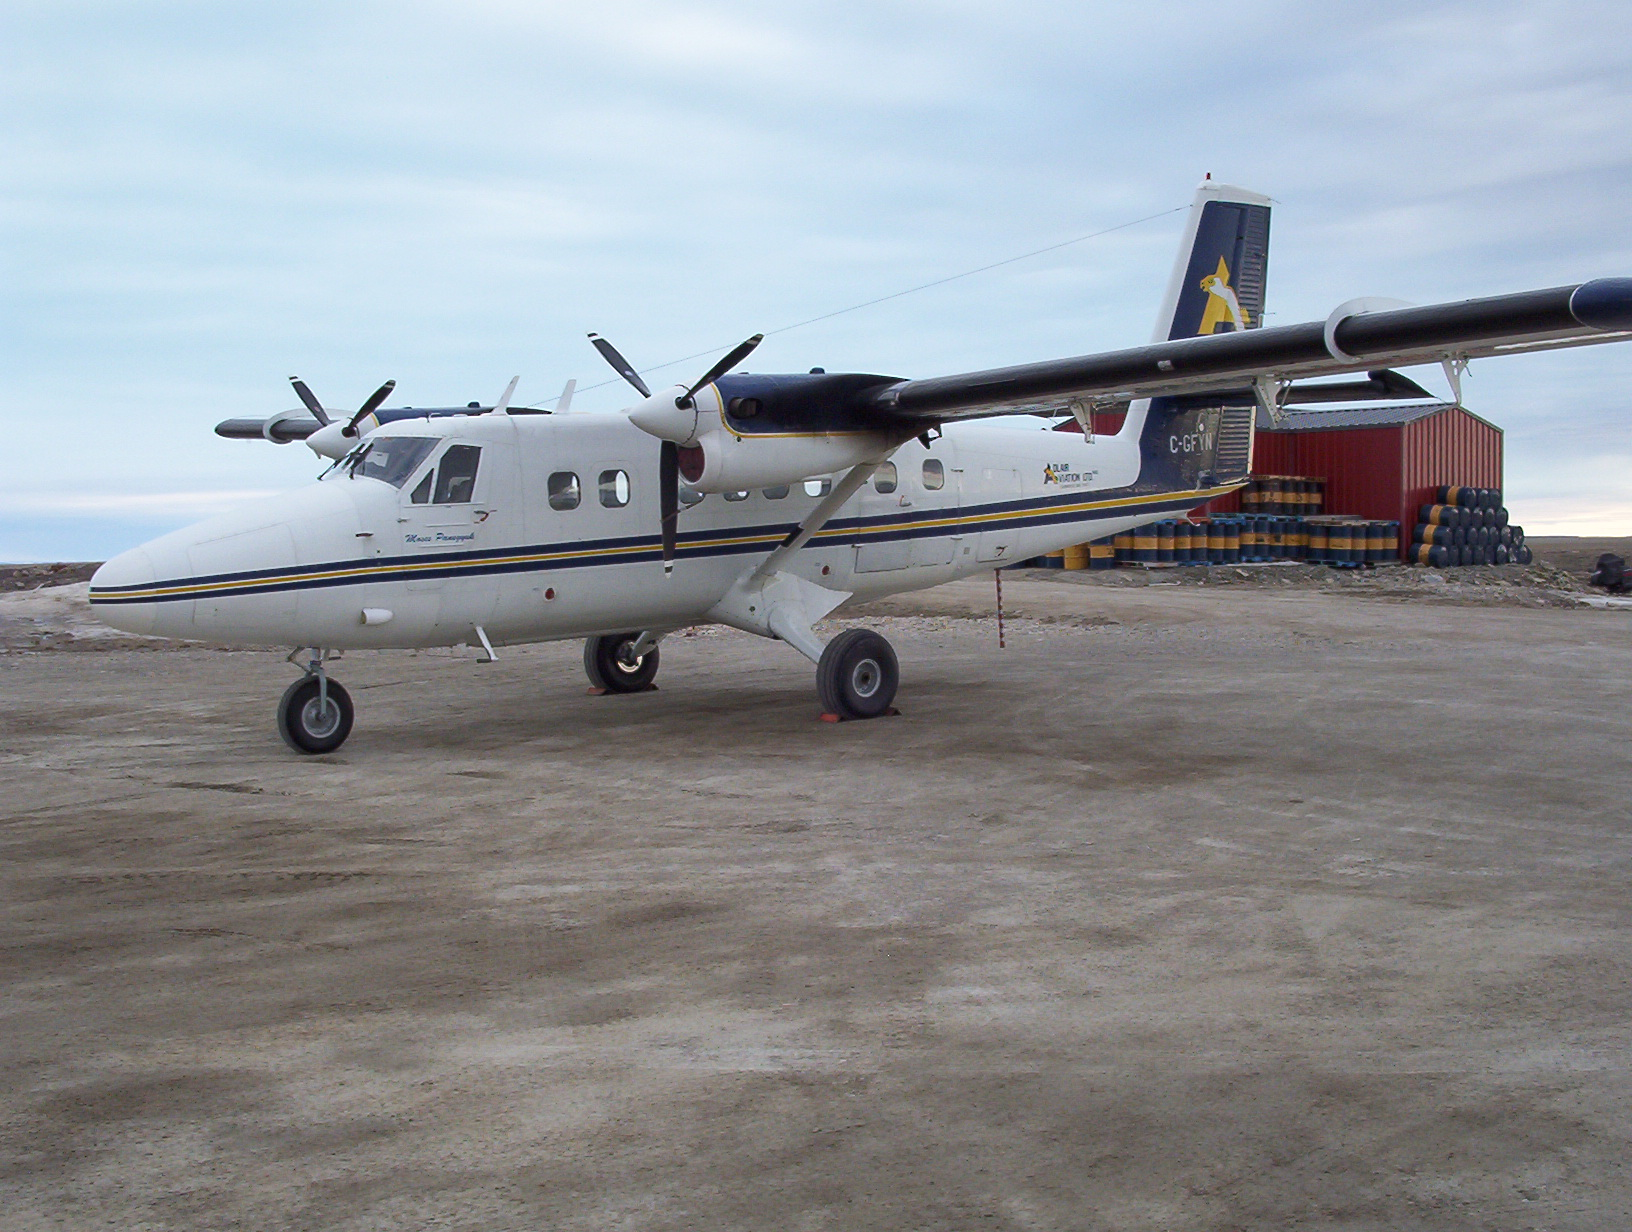 DHC-6 Twin Otter http://hu.wikipedia.org/wiki/DHC%E2%80%936_Twin_Otter - Вьетнам получил последний самолёт DHC-6 Twin Otter | Военно-исторический портал Warspot.ru